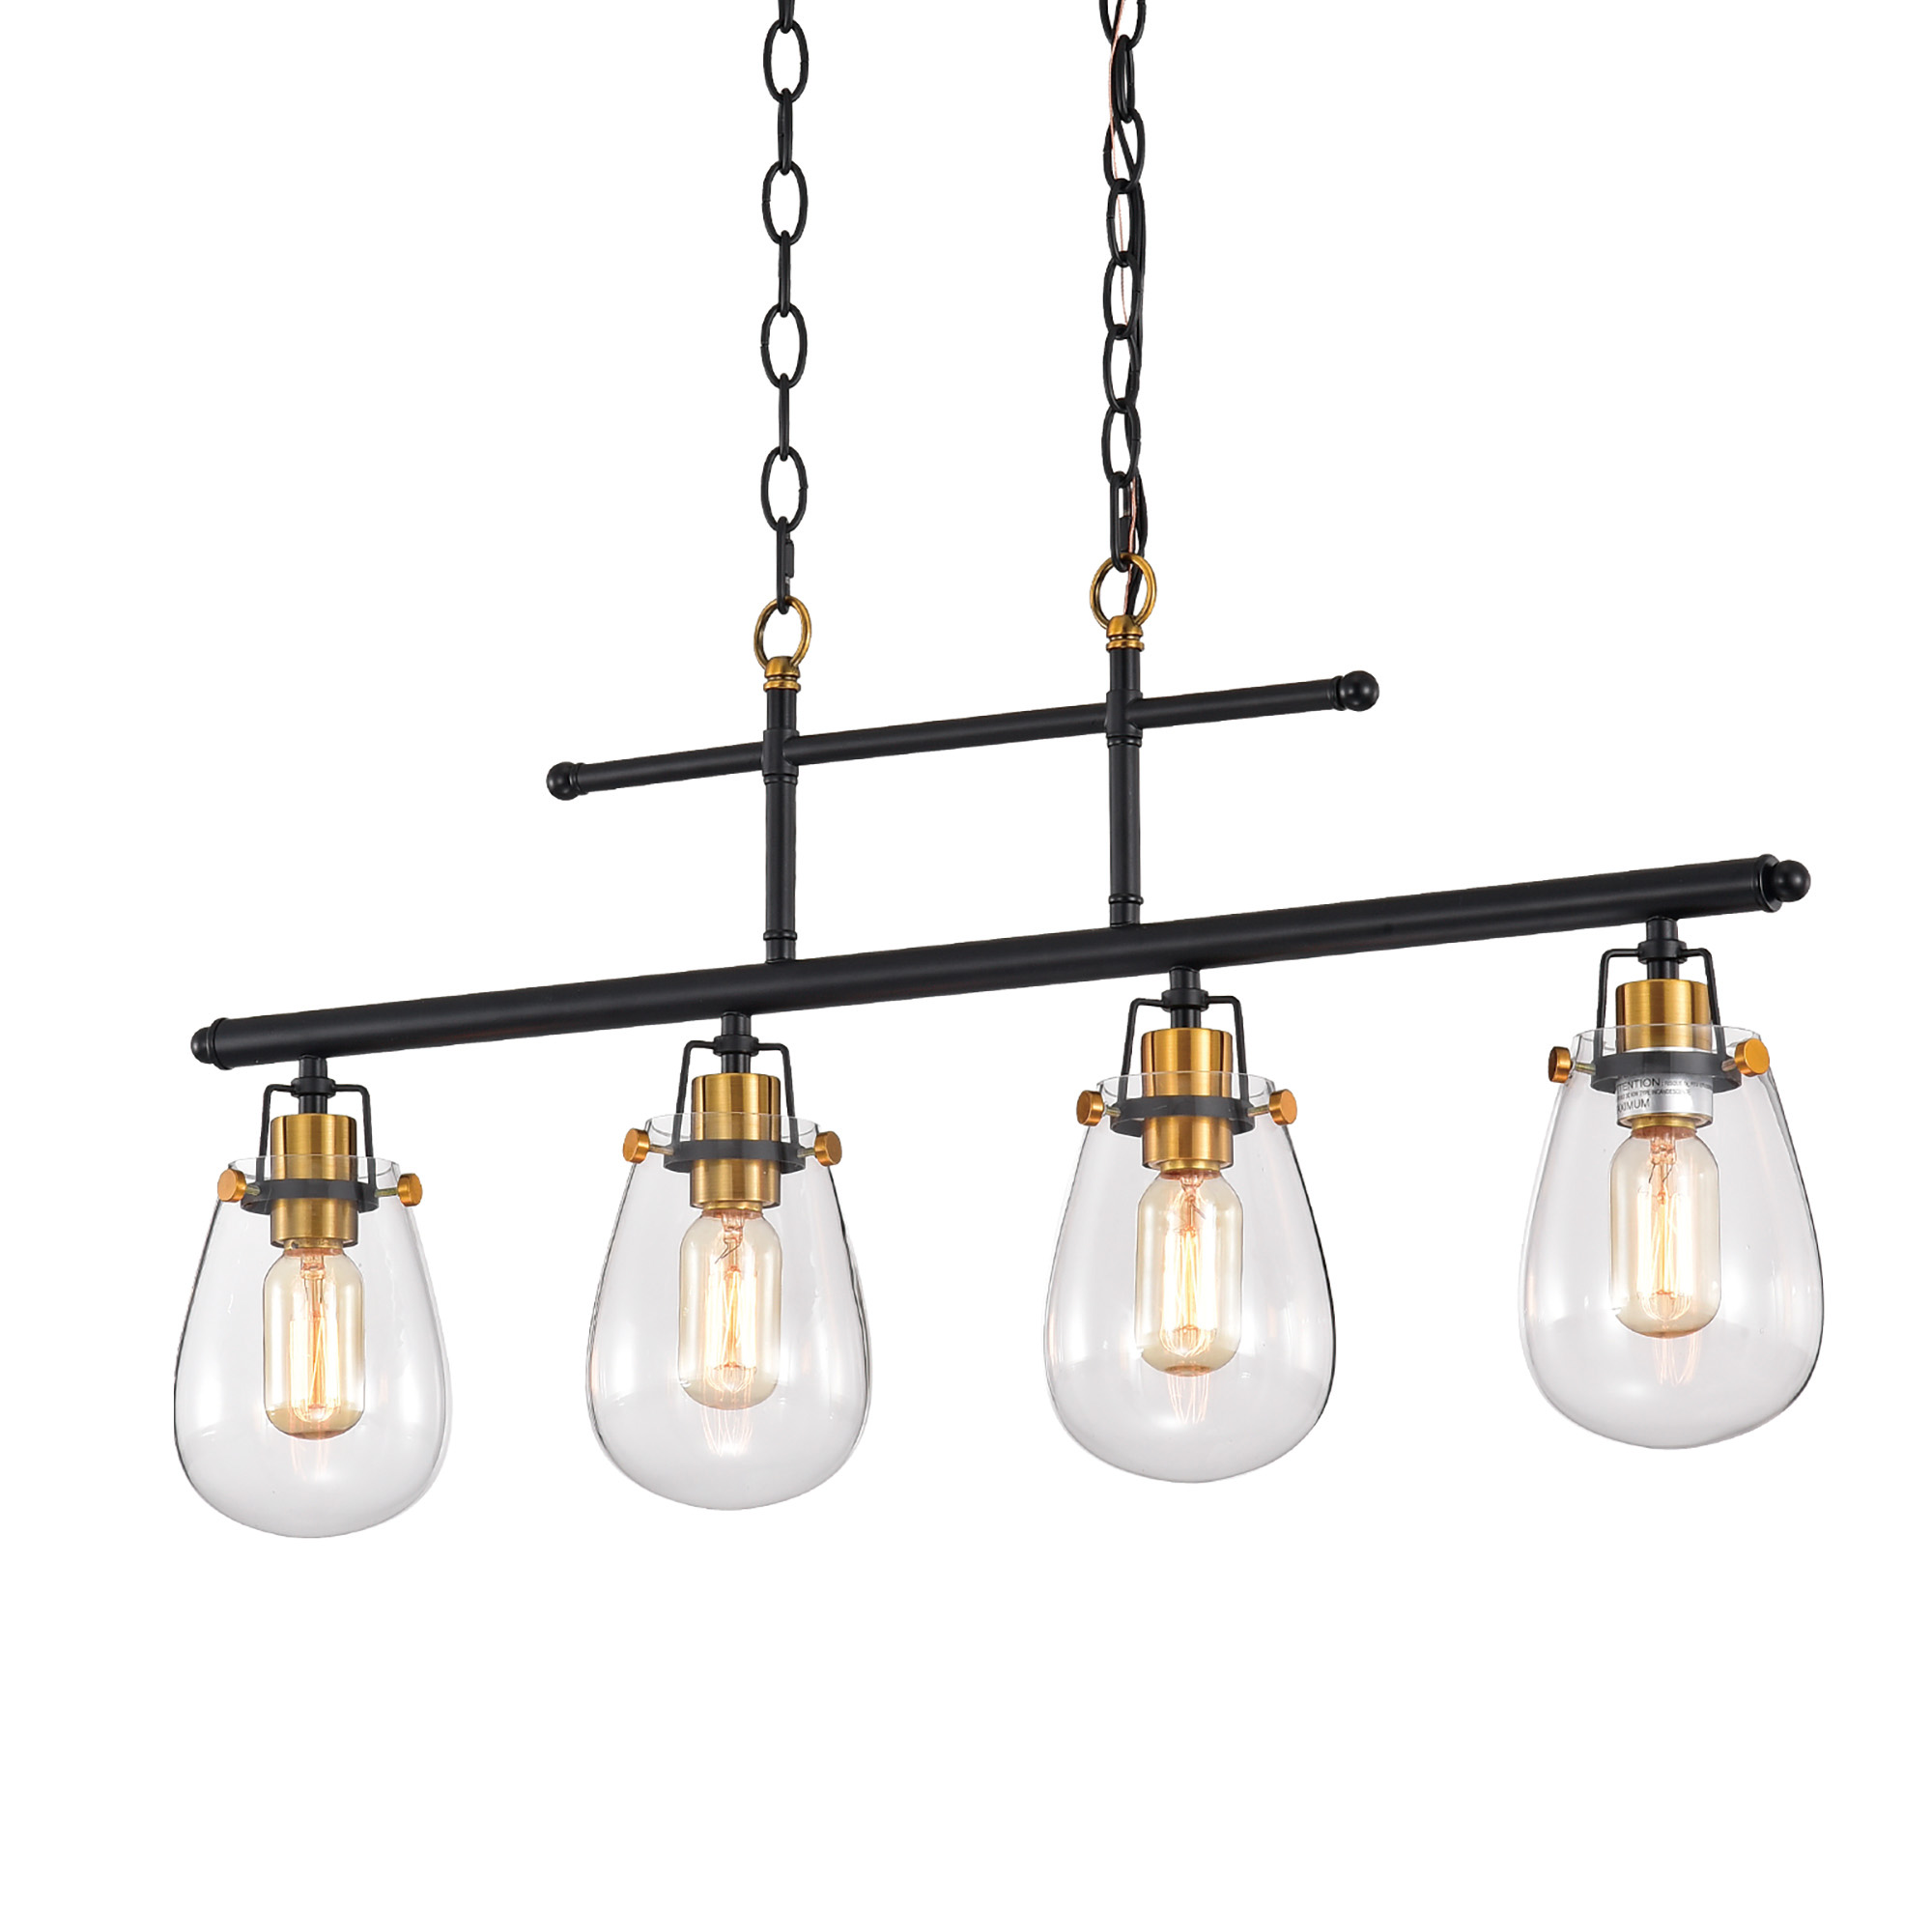 Ontario 4 Light Black And Antique Gold Kitchen Island Chandelier Edvivi Lighting